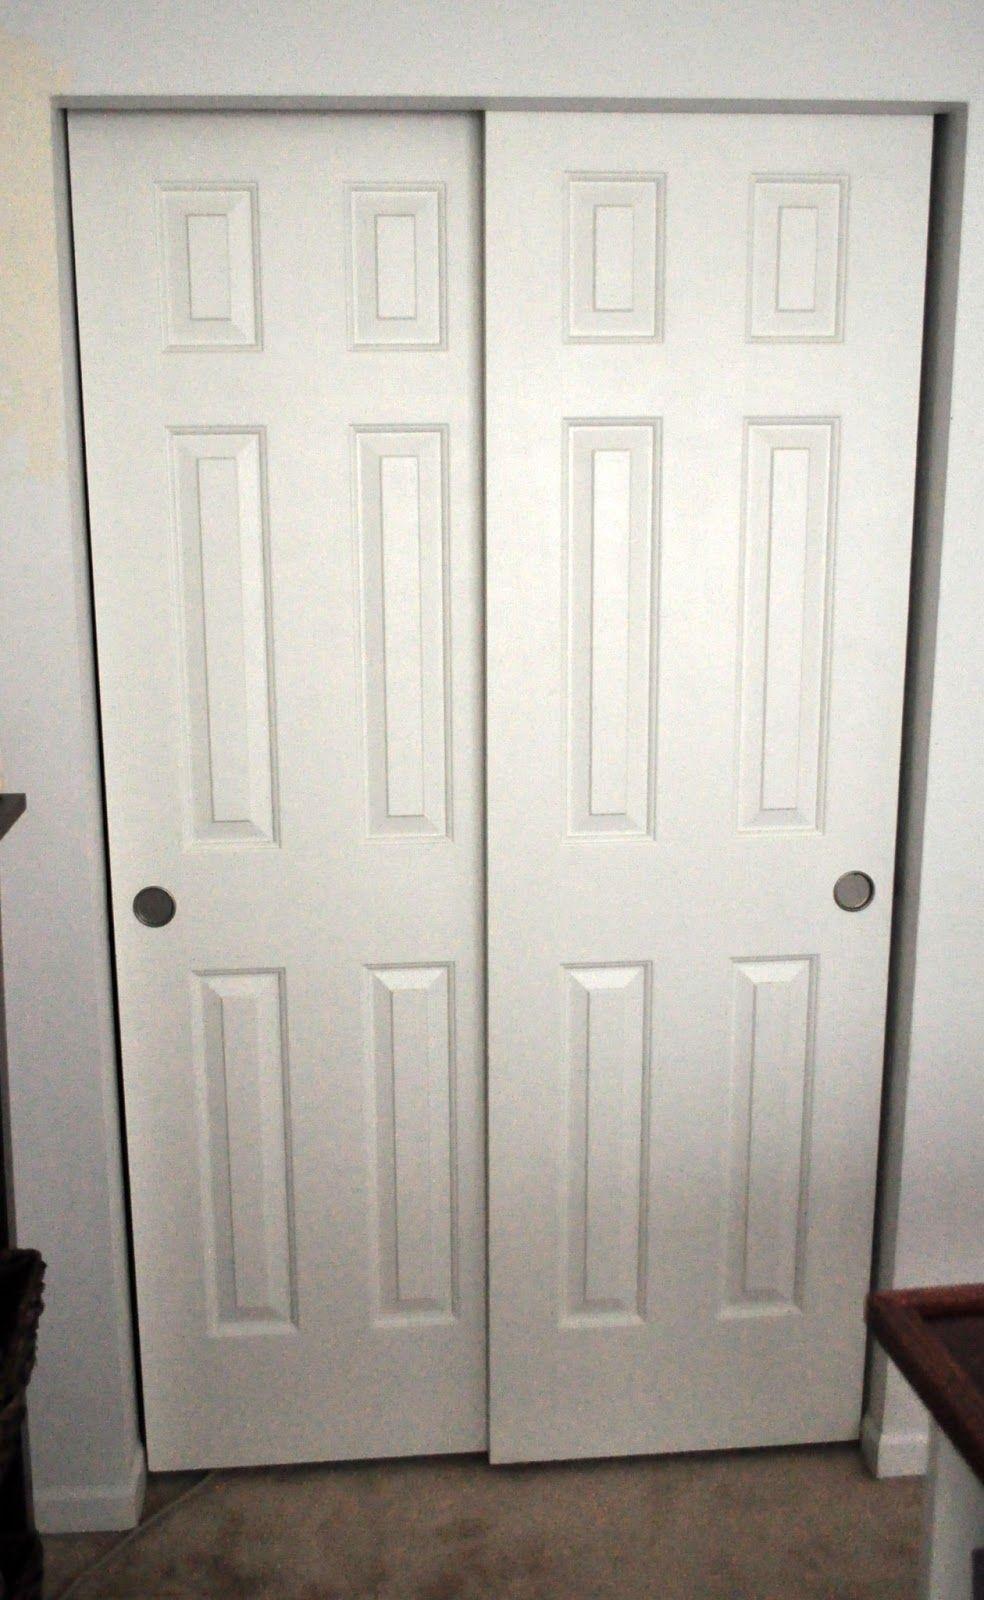 Charmant Double Sliding Closet Door Hardware